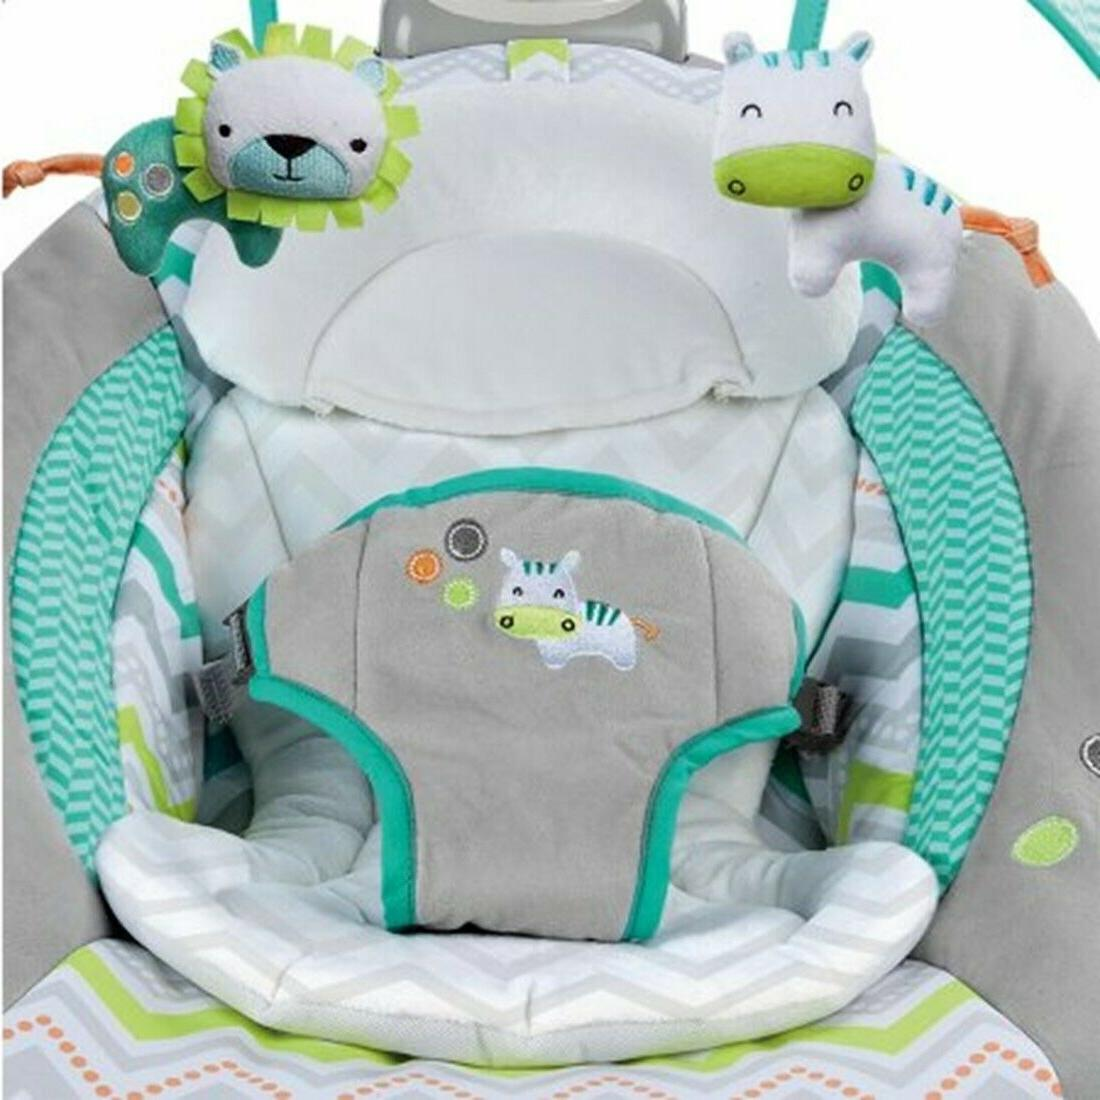 Baby Playard Crib Infant Automatic Bouncer set